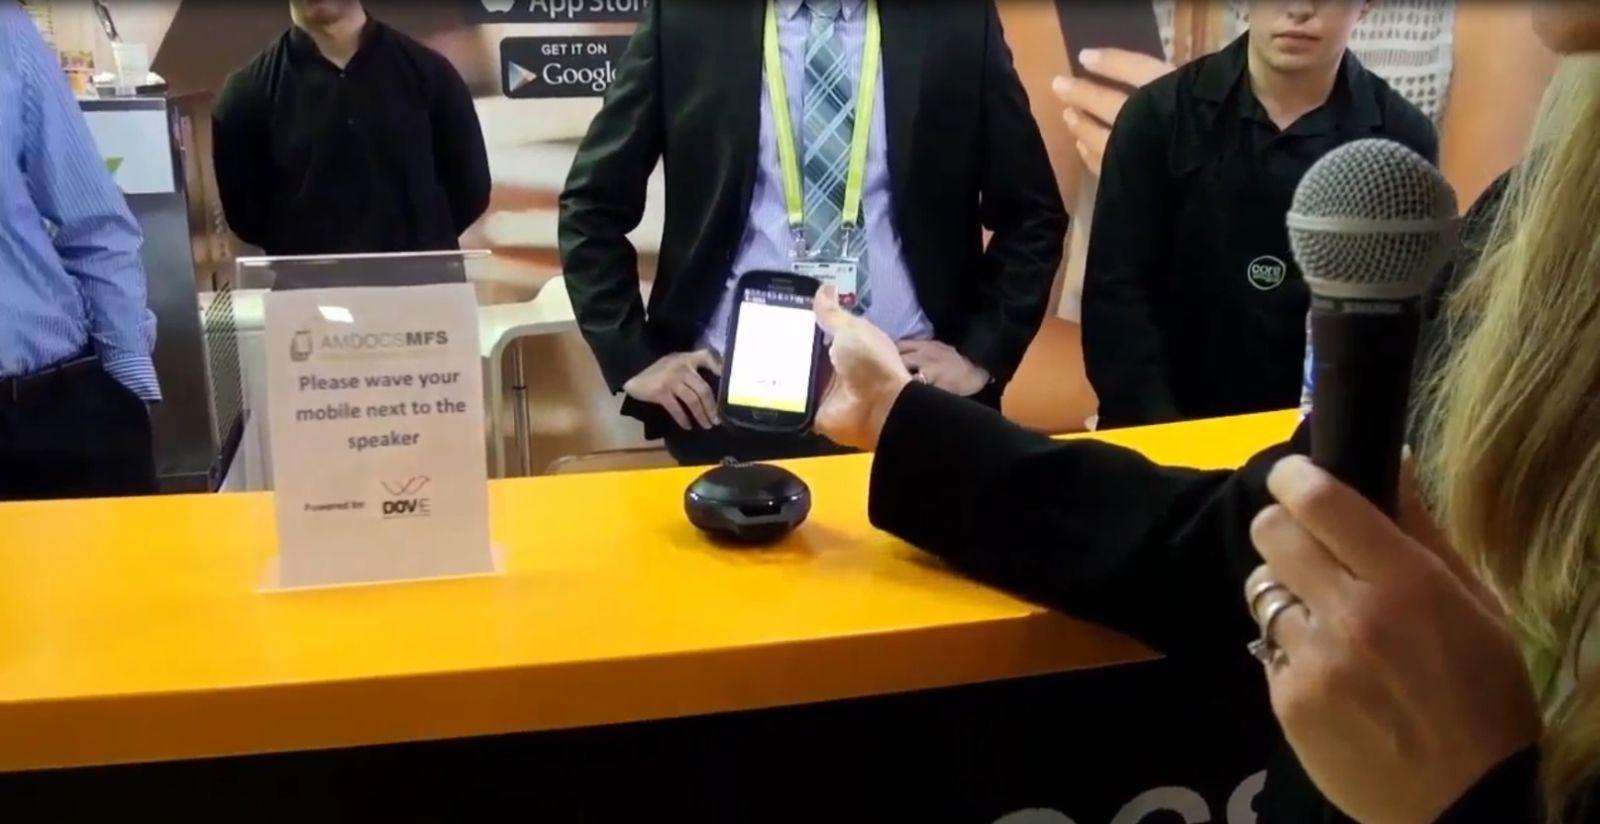 Using the Amdocs Mobile Wallet with DOV-E tech inside. Photo courtesy of DOV-E